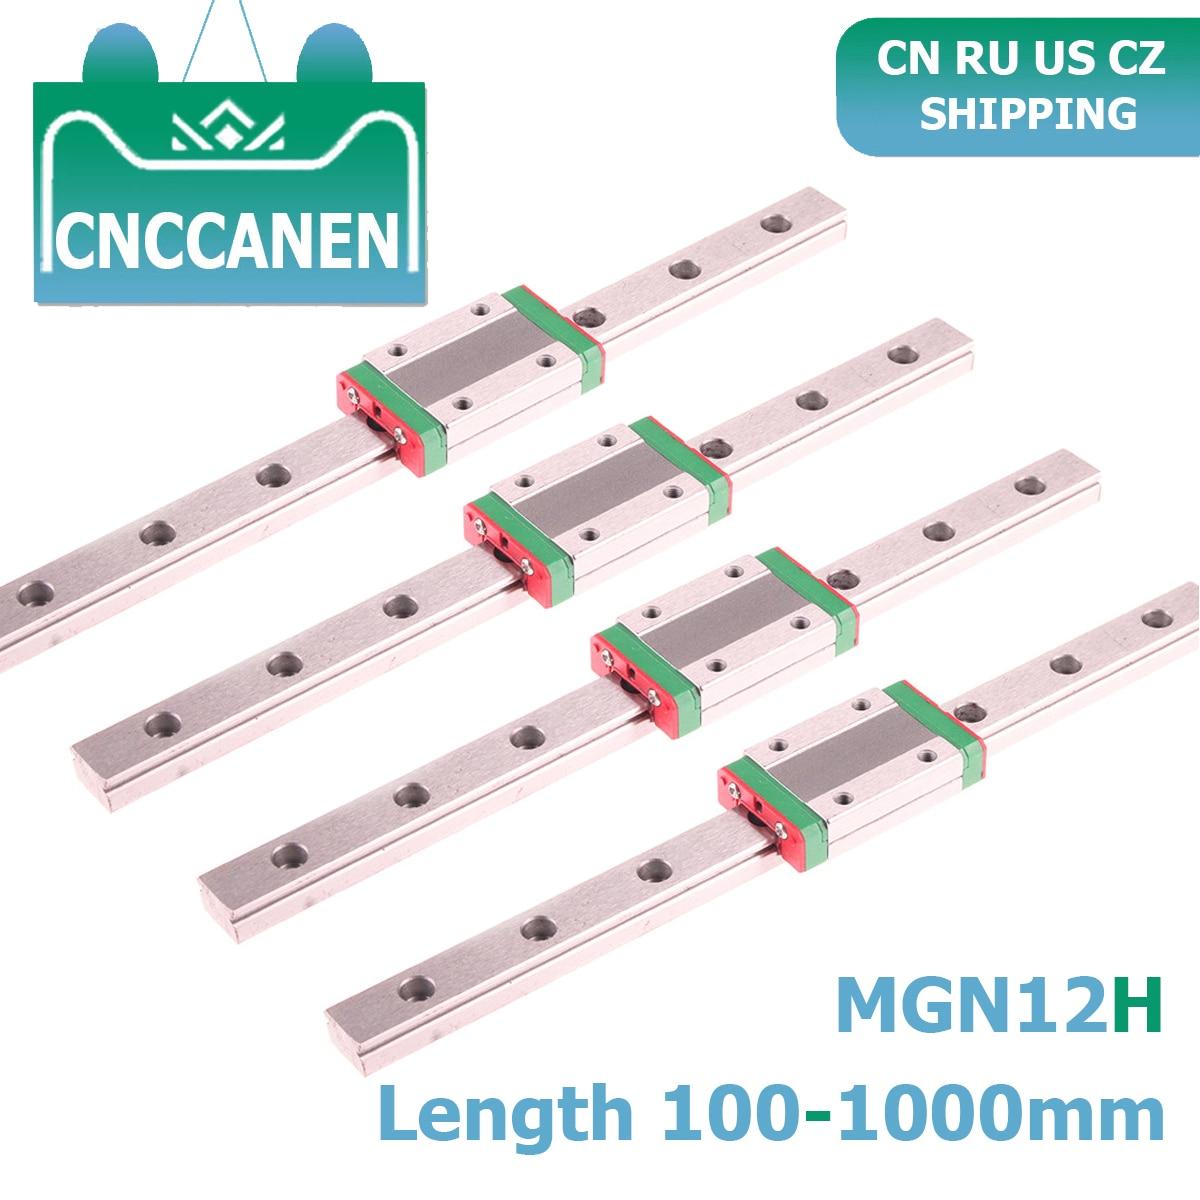 Peças cnc mgn12 100 350 450 500 800 1000mm diminuto trilho linear slide 4 peças guia linear mgn + 4 peças mgn12h transporte impressora 3d